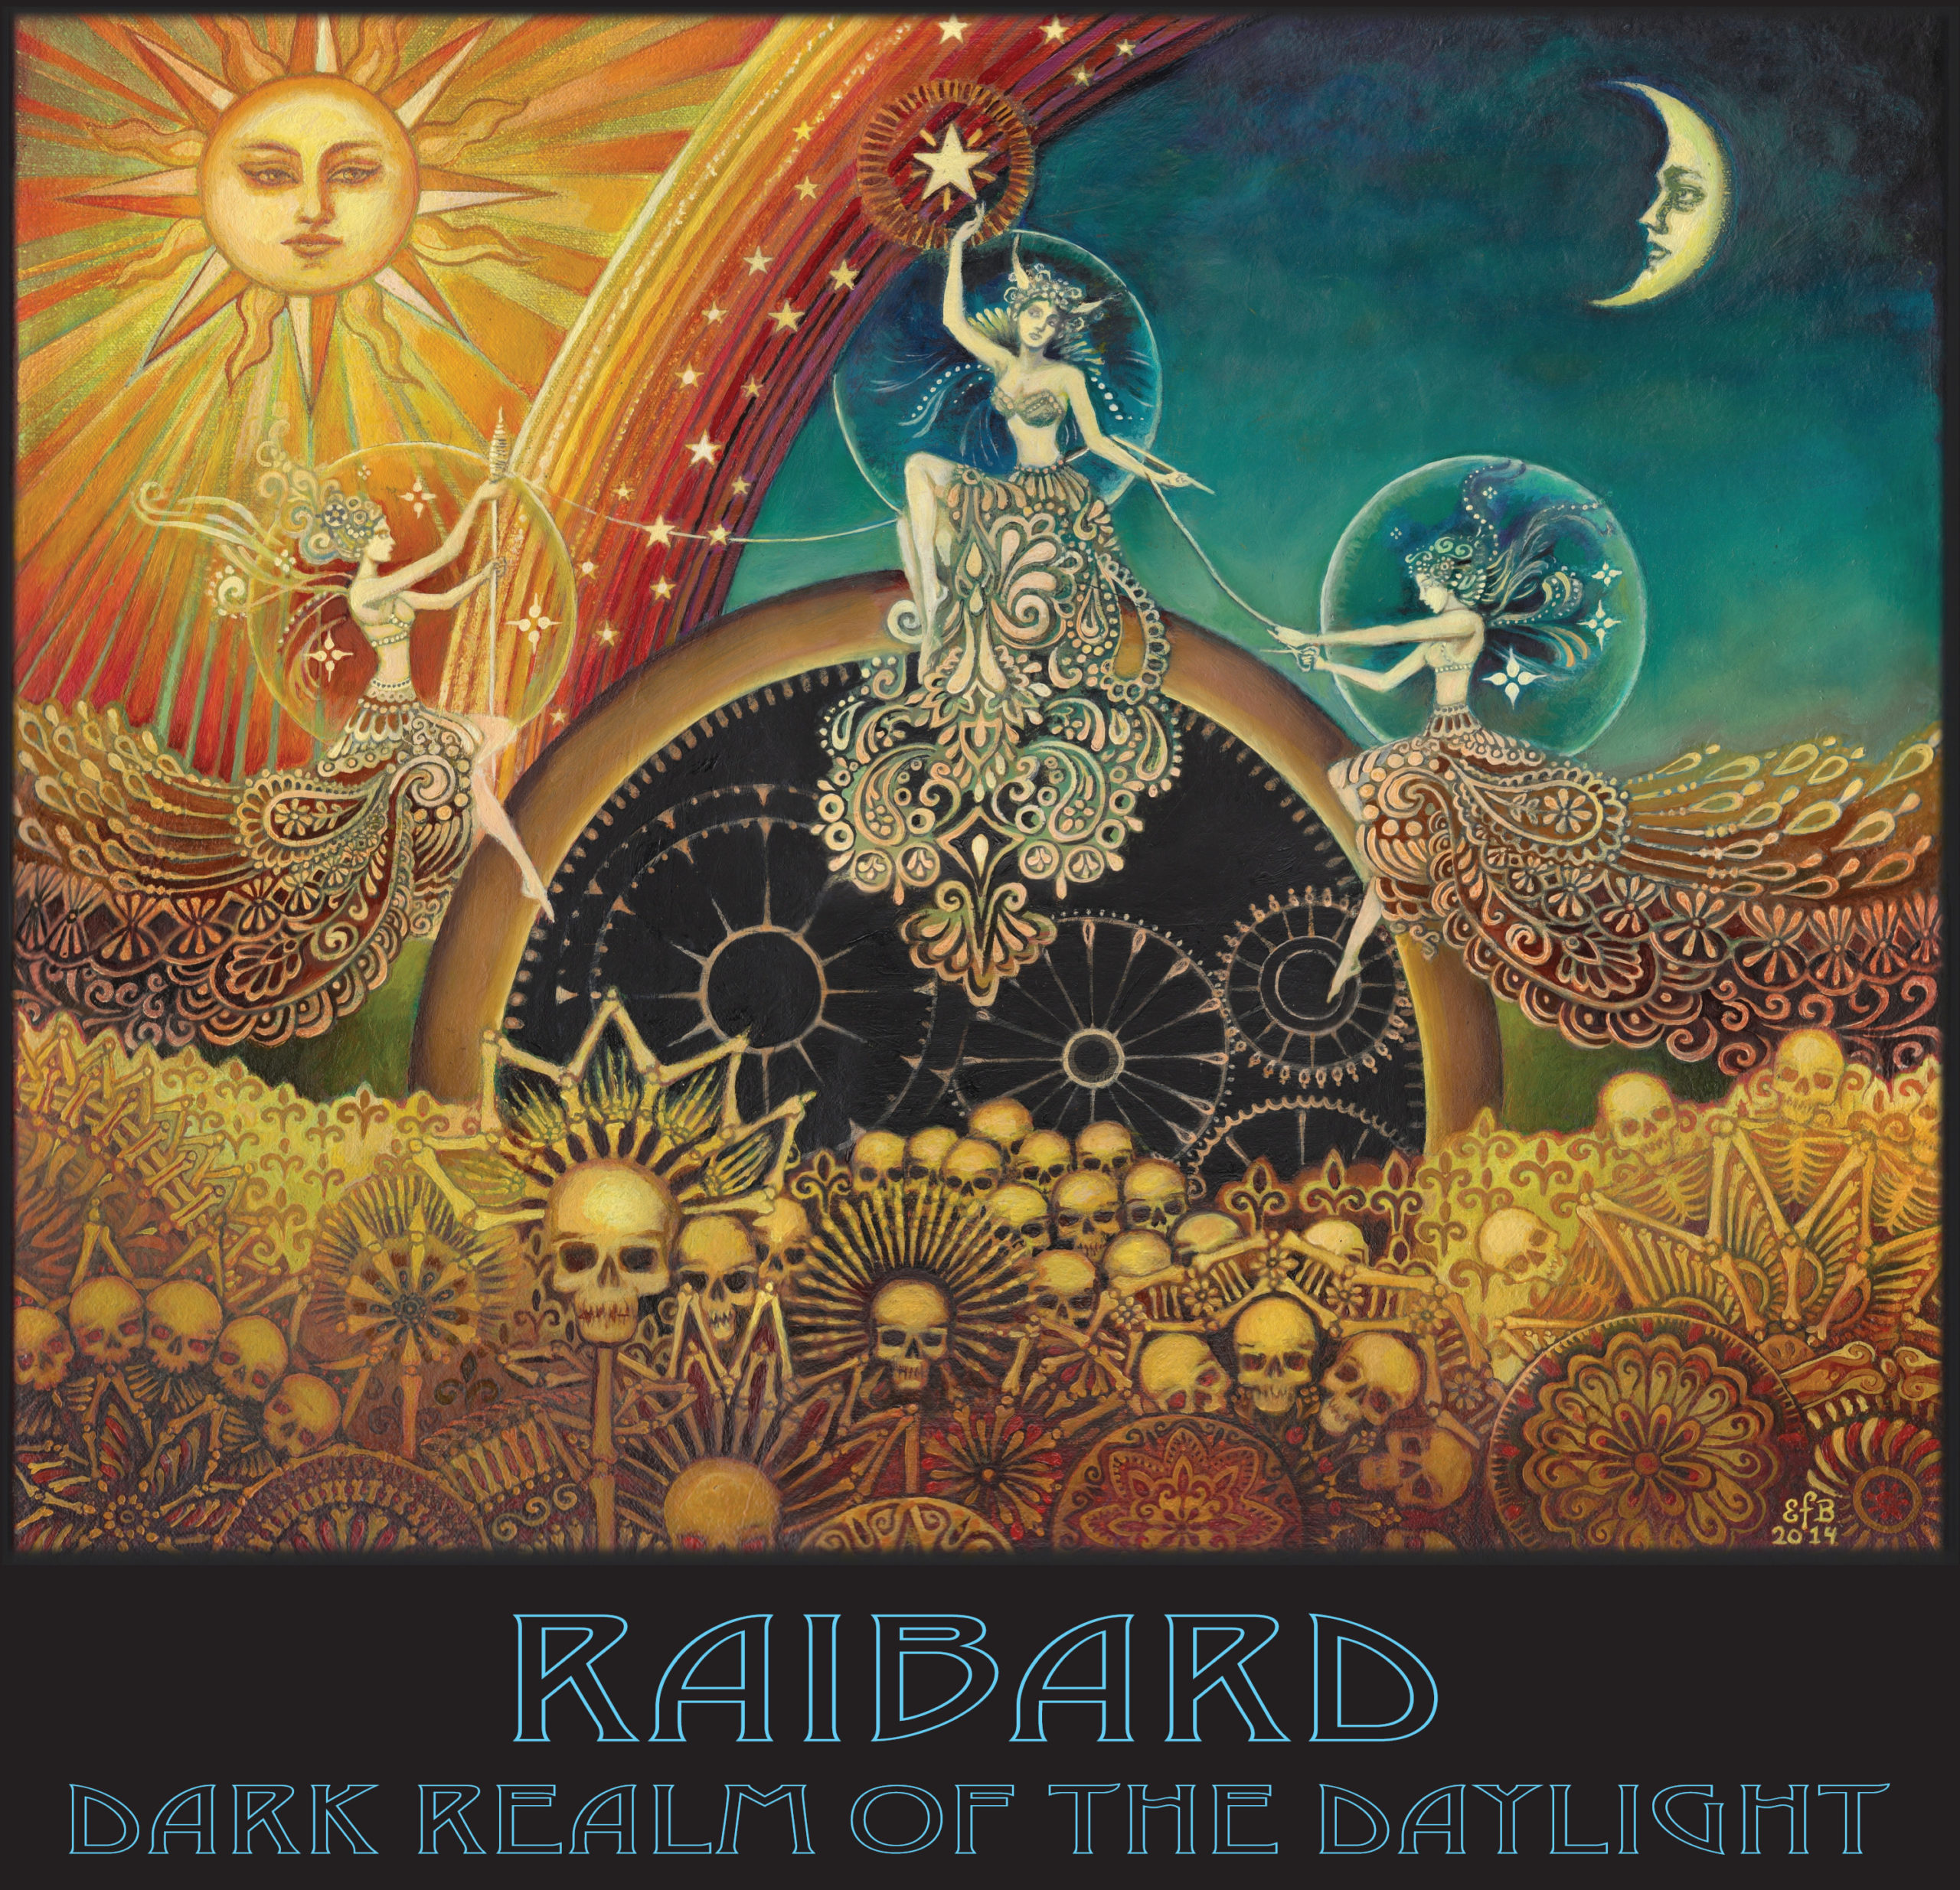 Raibard Dark Realm of the Daylight